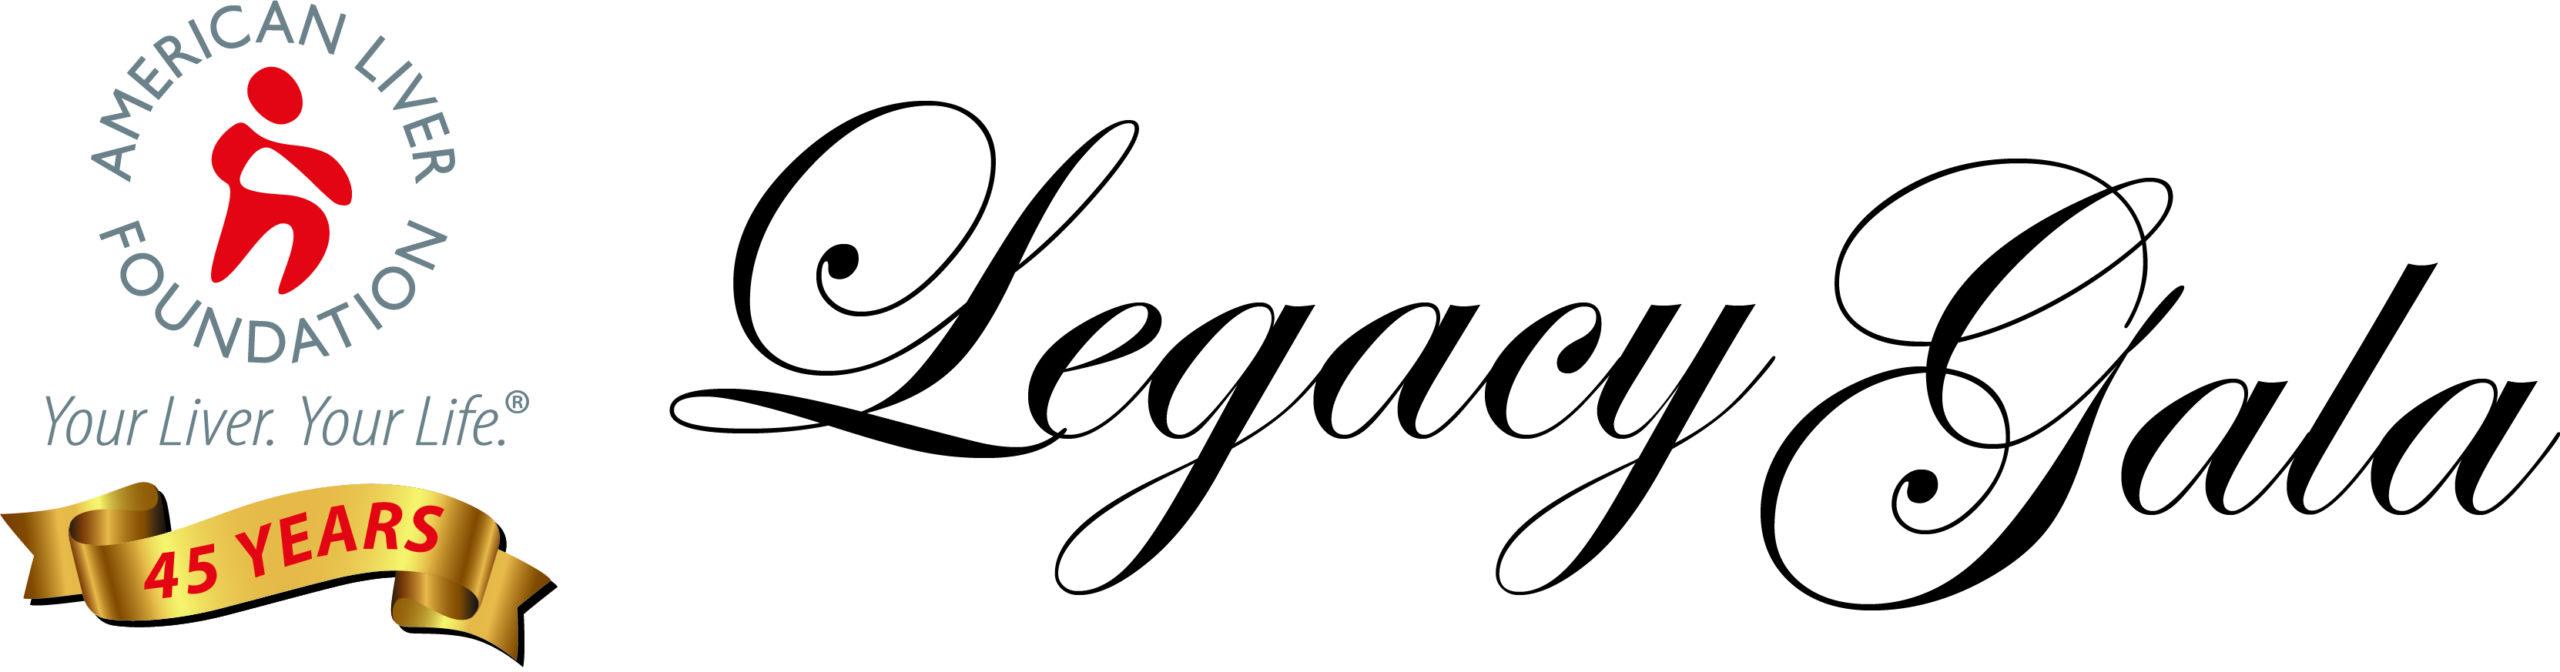 45th Anniversary Legacy Gala